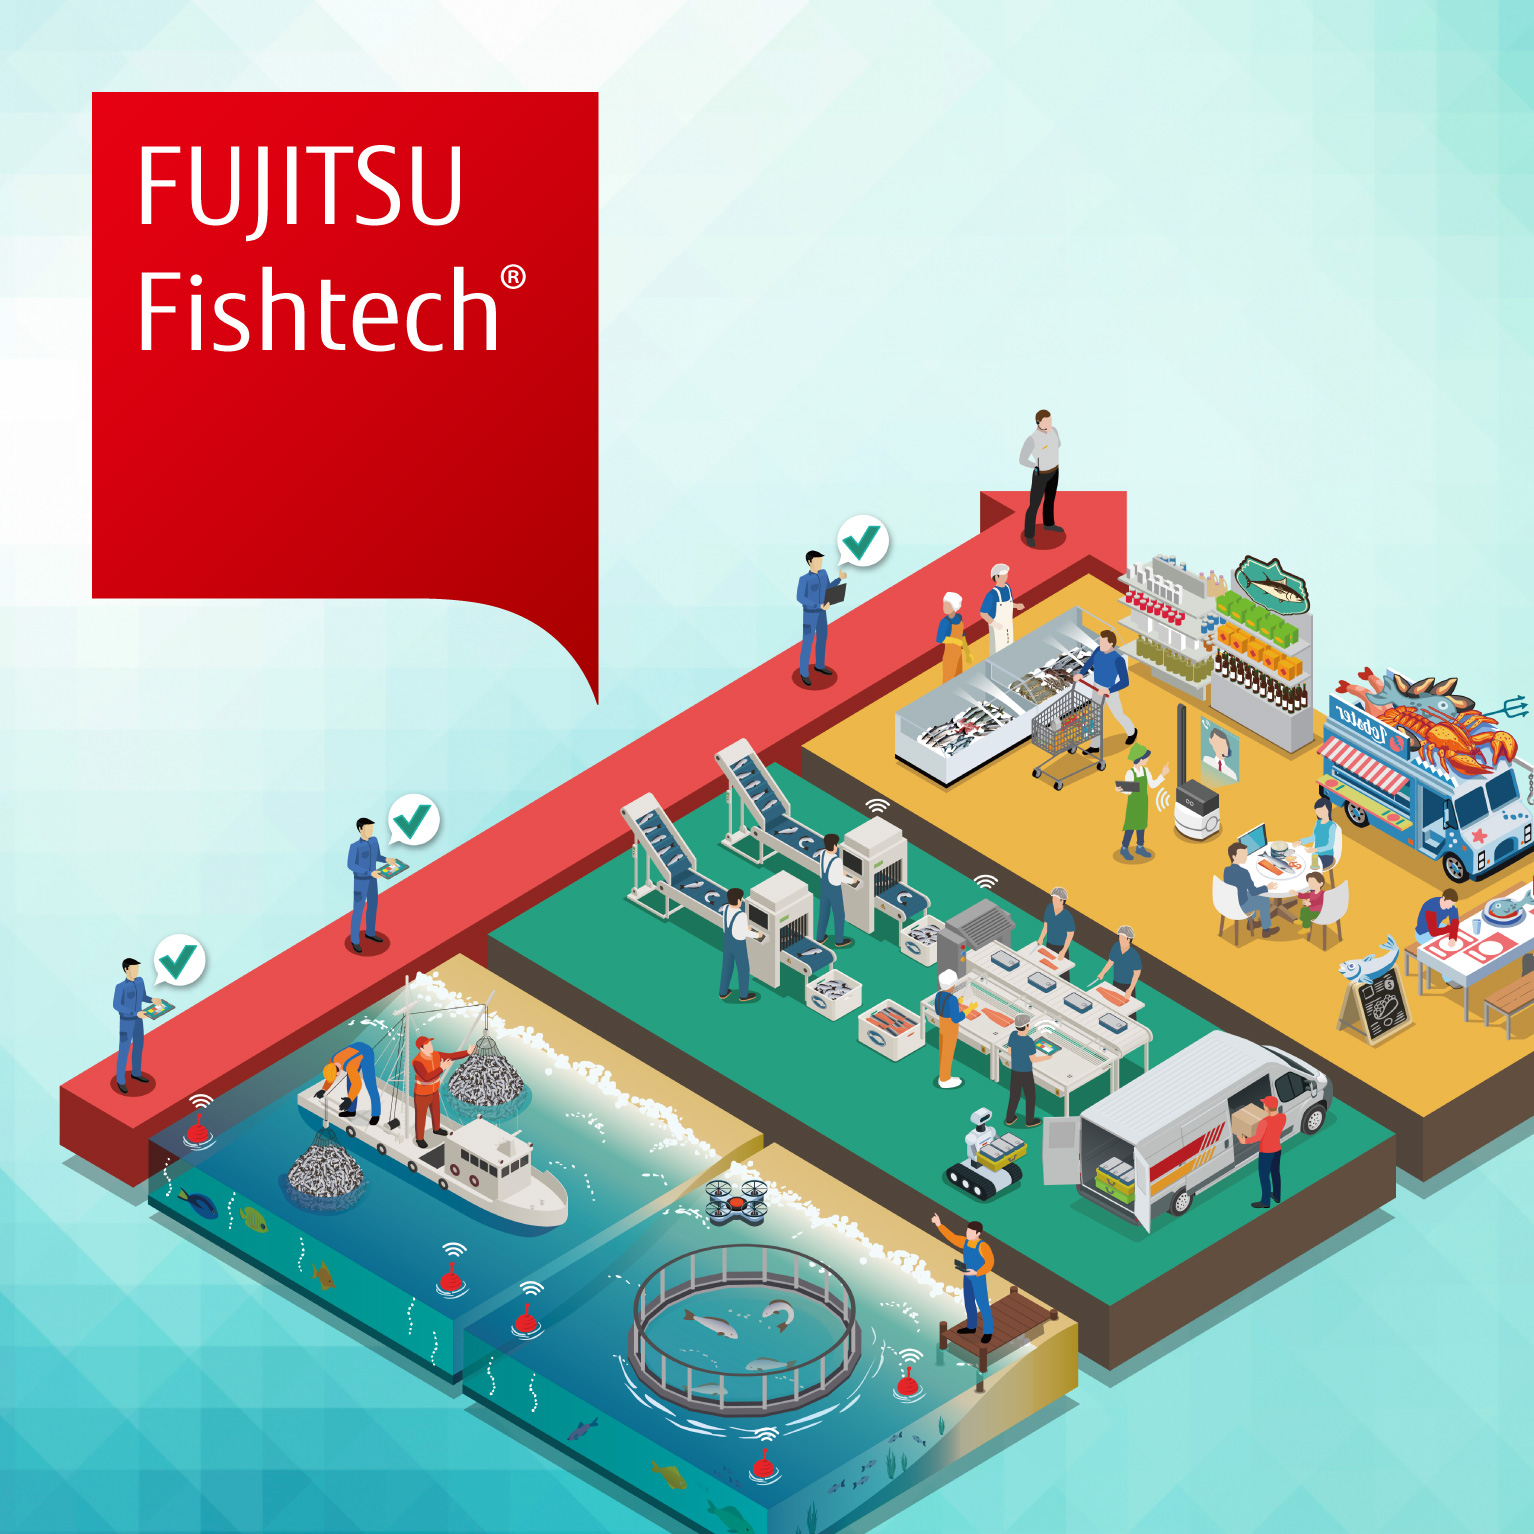 FUJITSU Fishtech®